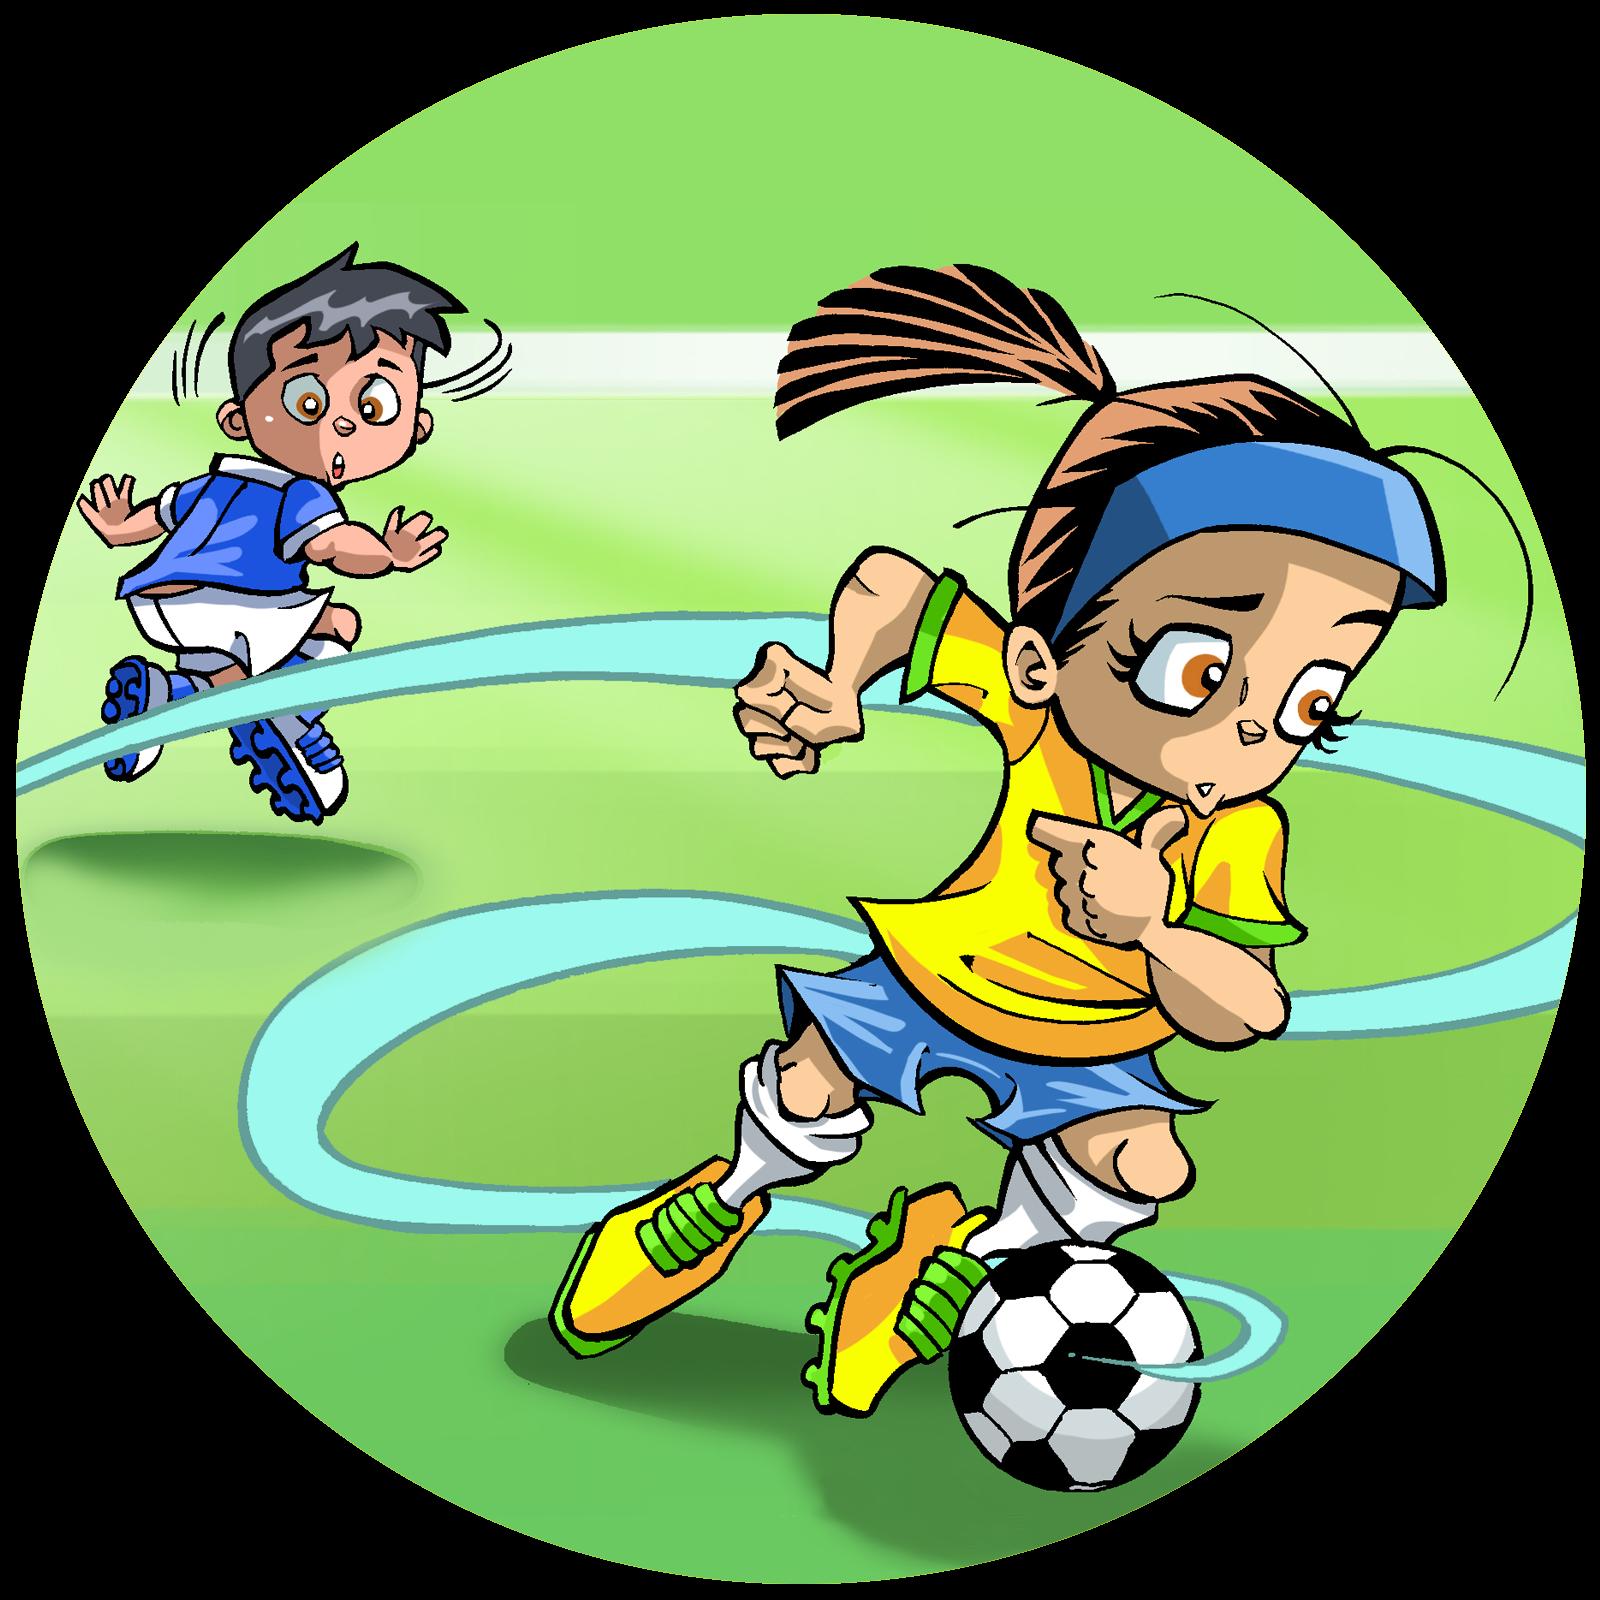 Coach clipart soccer practice, Coach soccer practice.